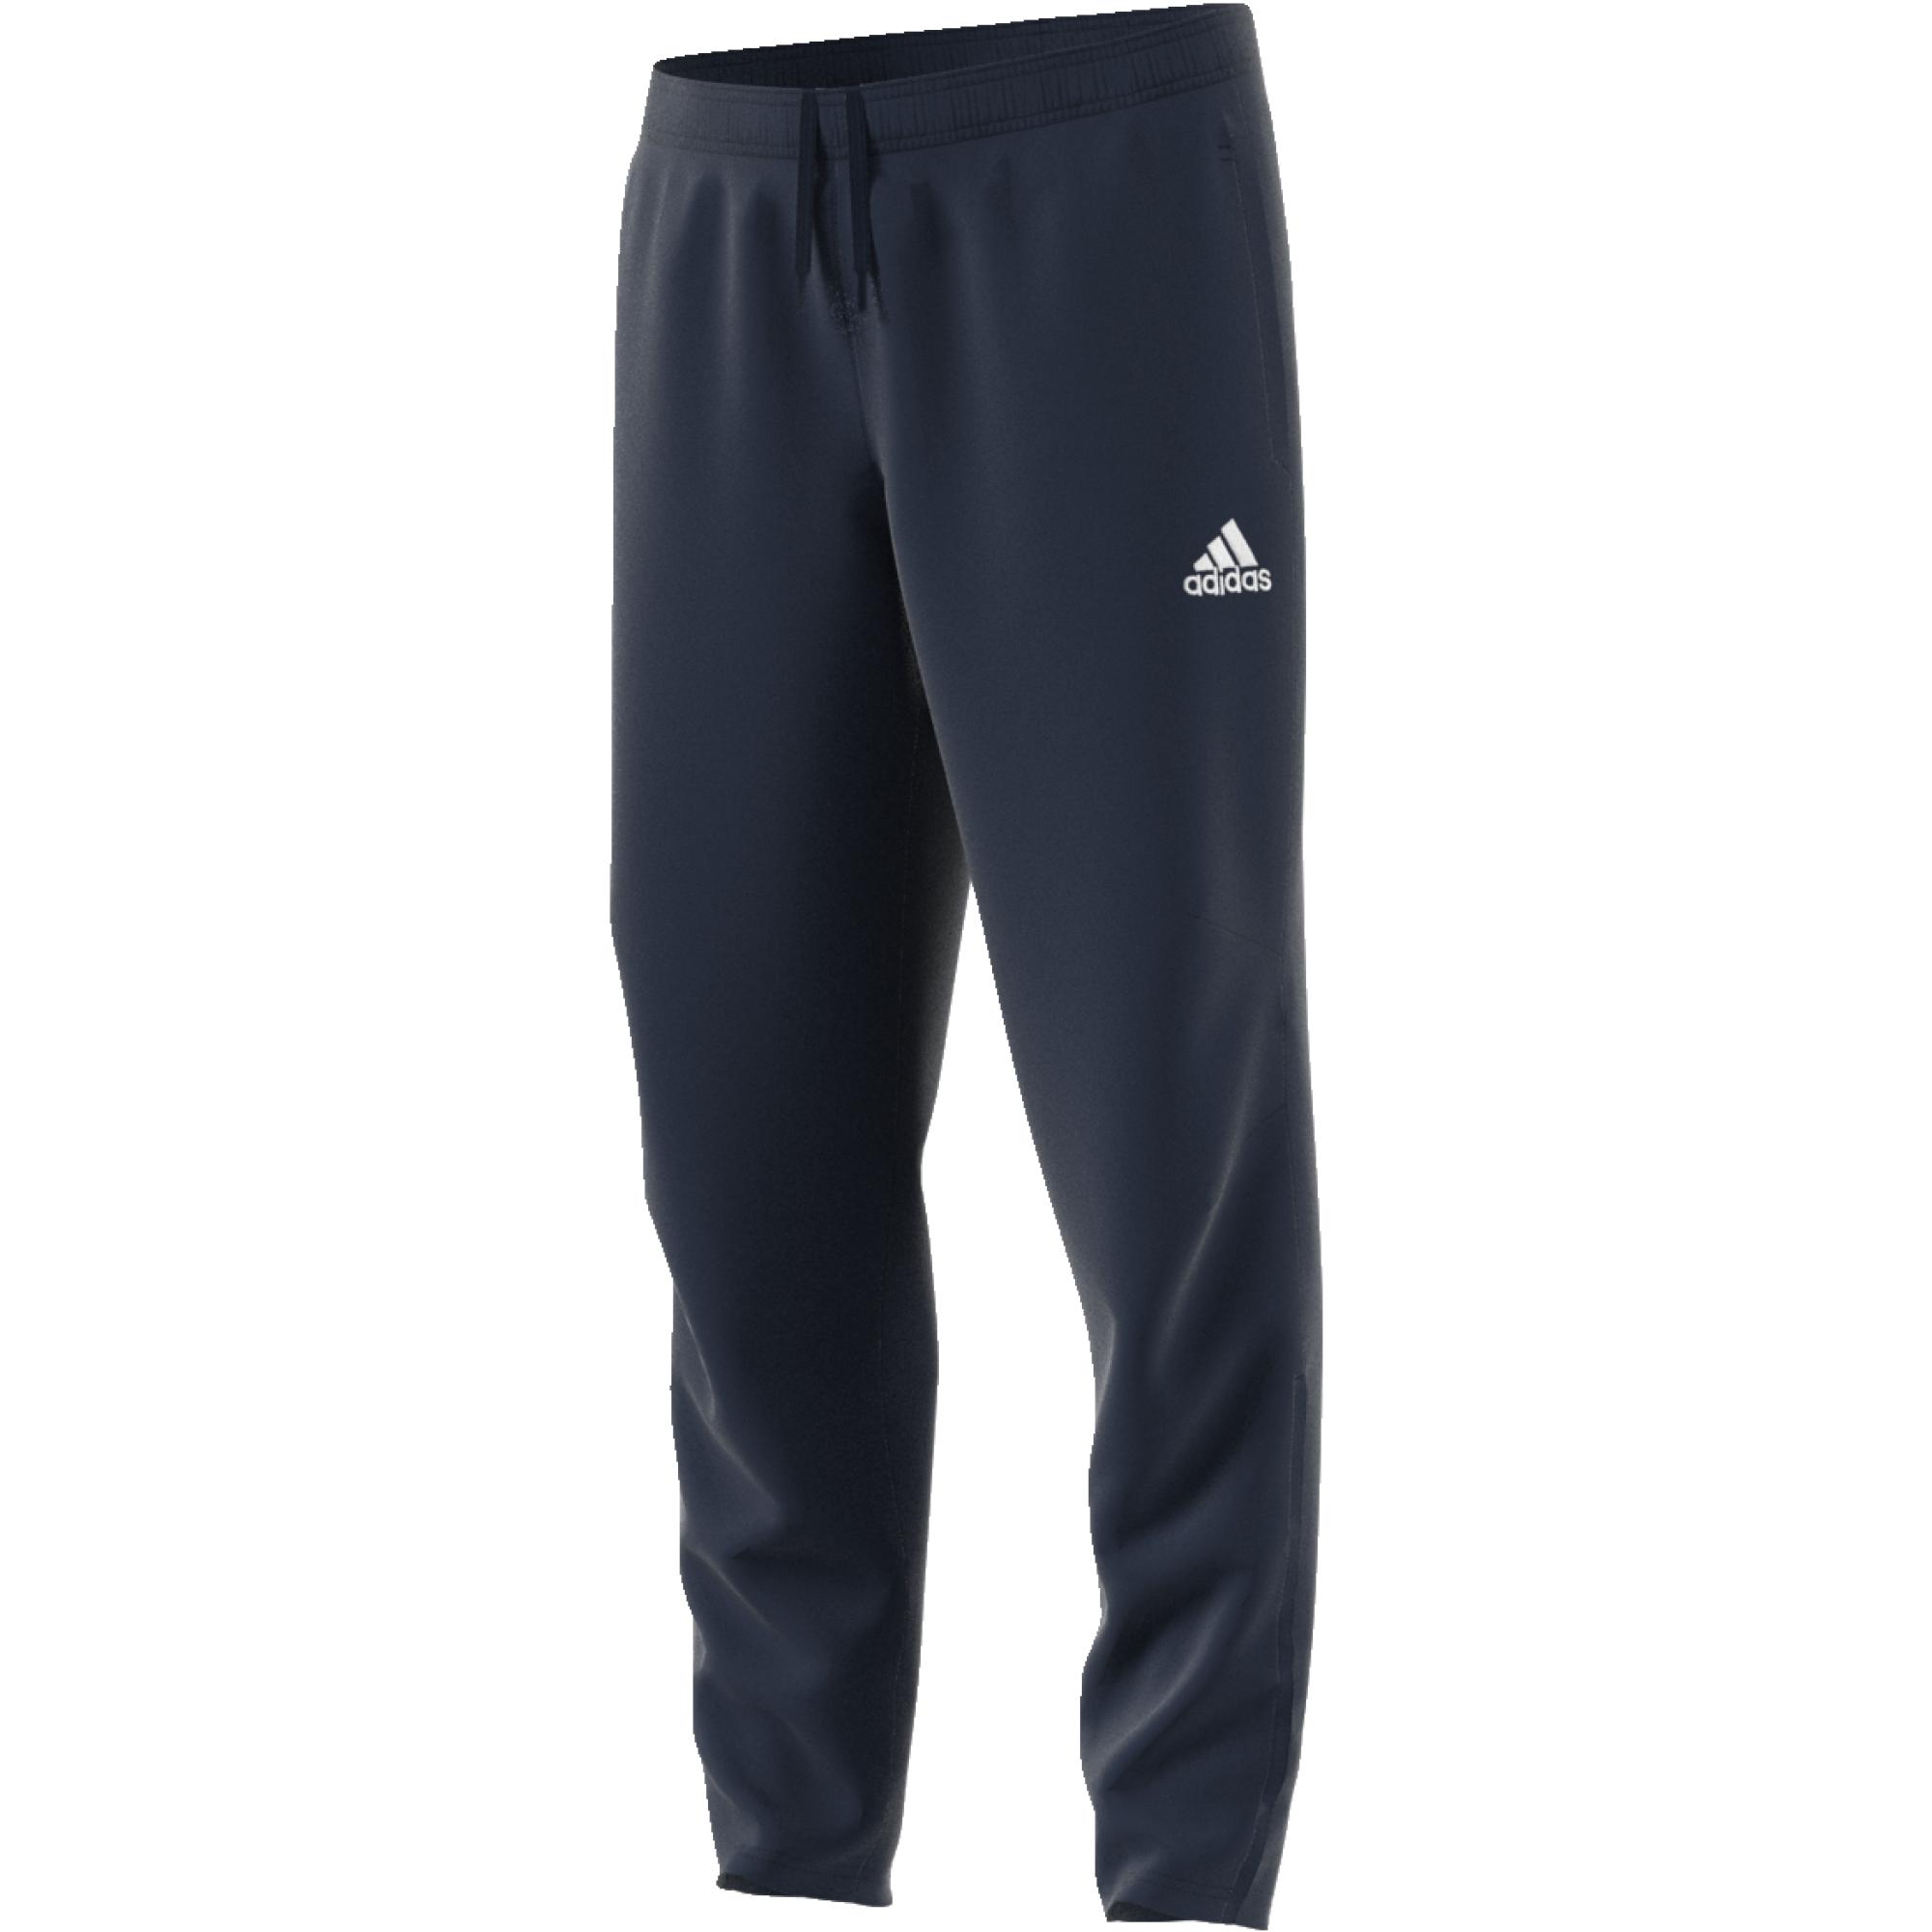 ADIDAS polyesterové kalhoty Tiro 17